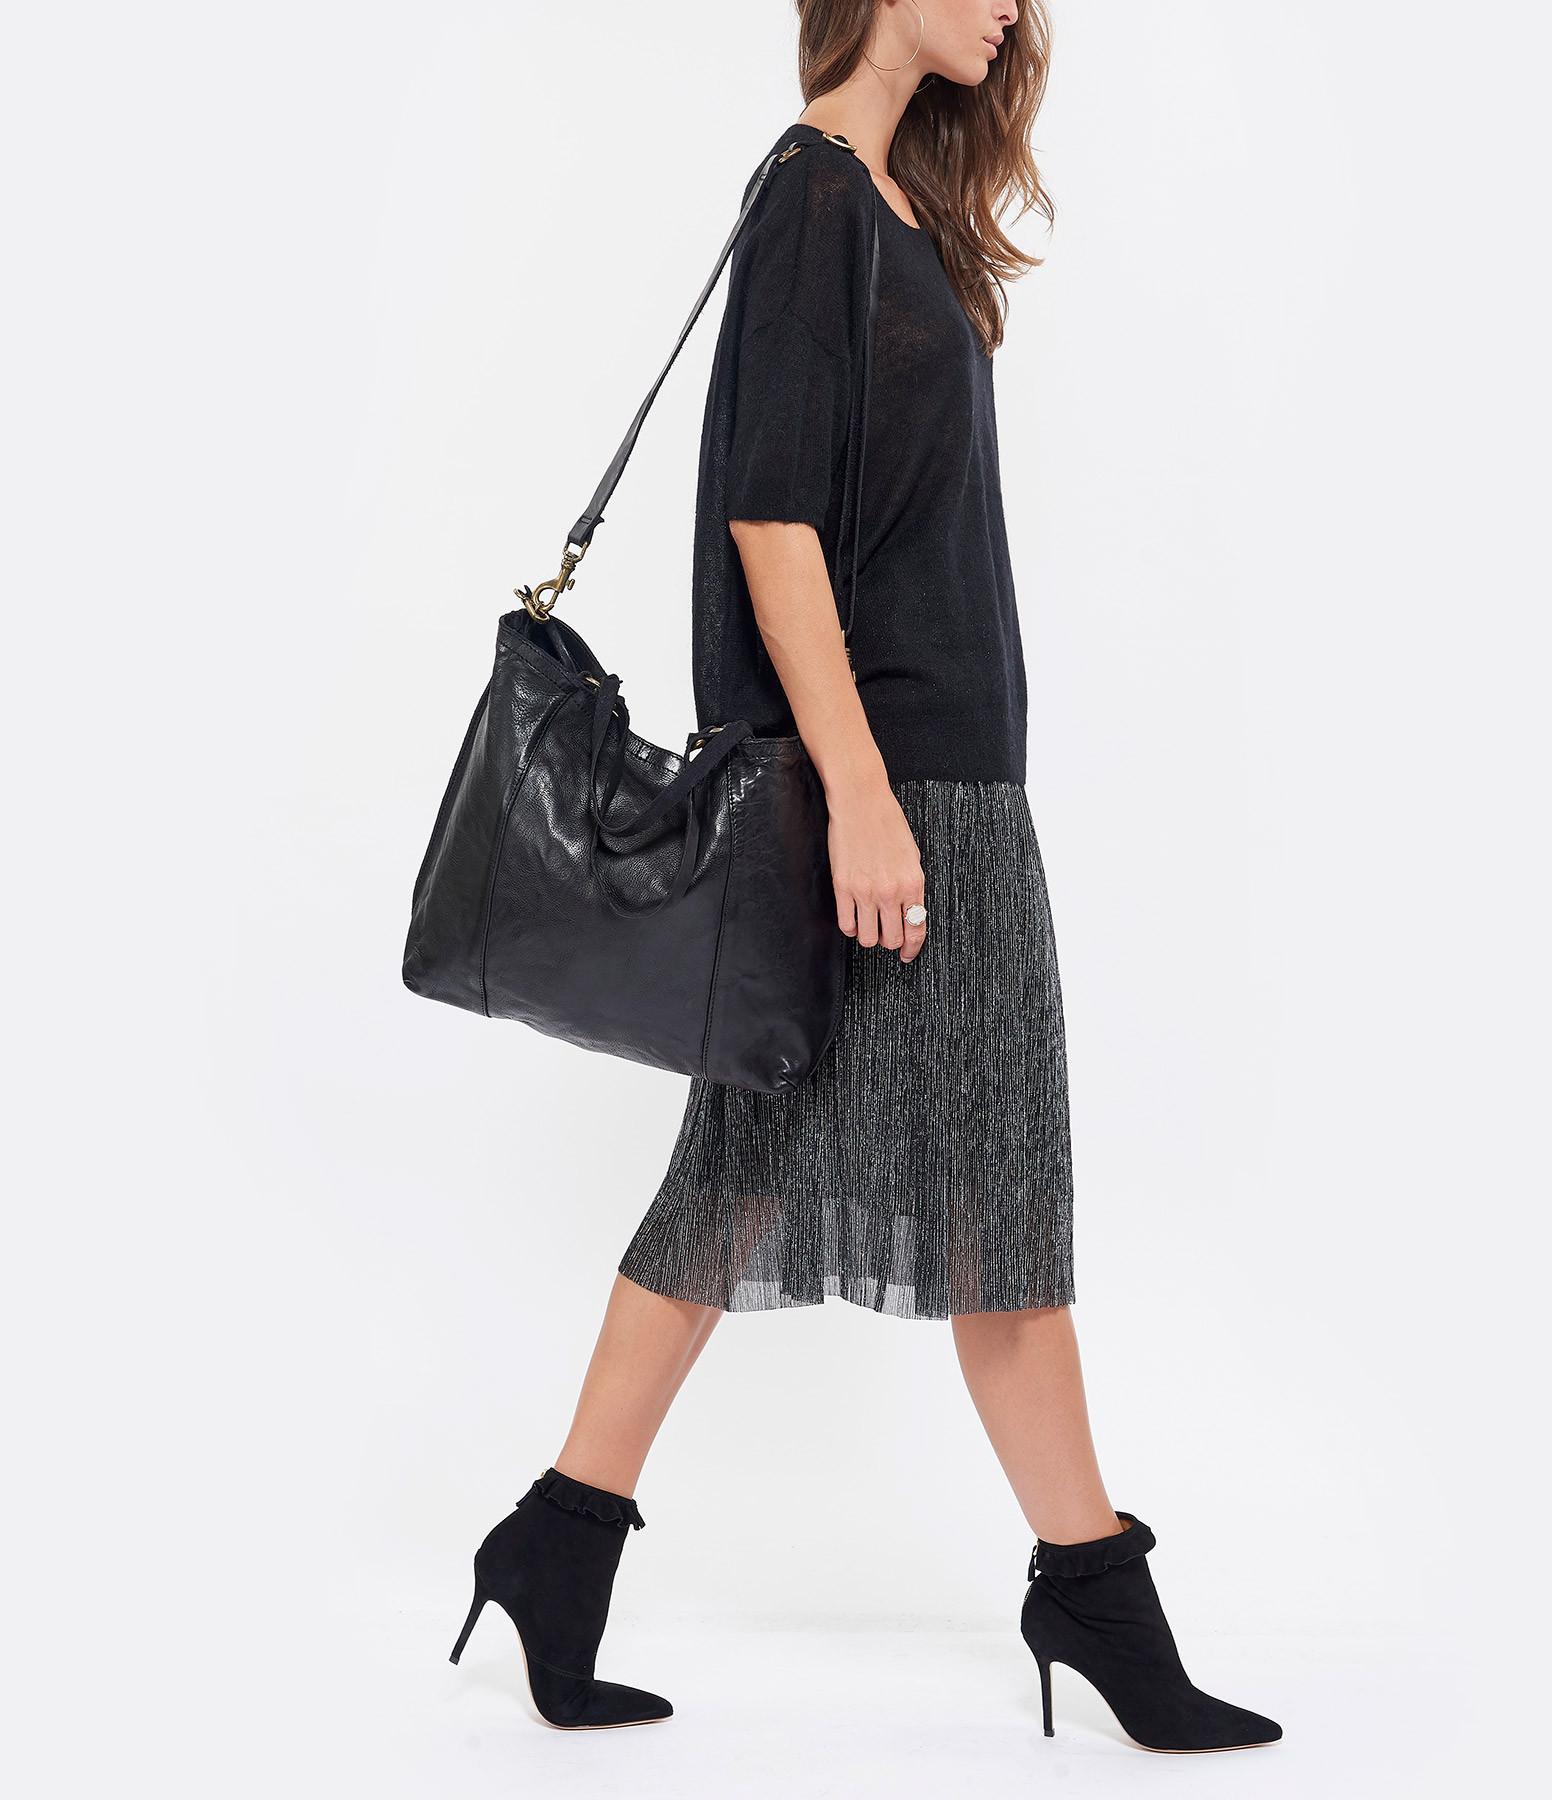 CAMPOMAGGI - Sac Shopping Big Cuir Noir